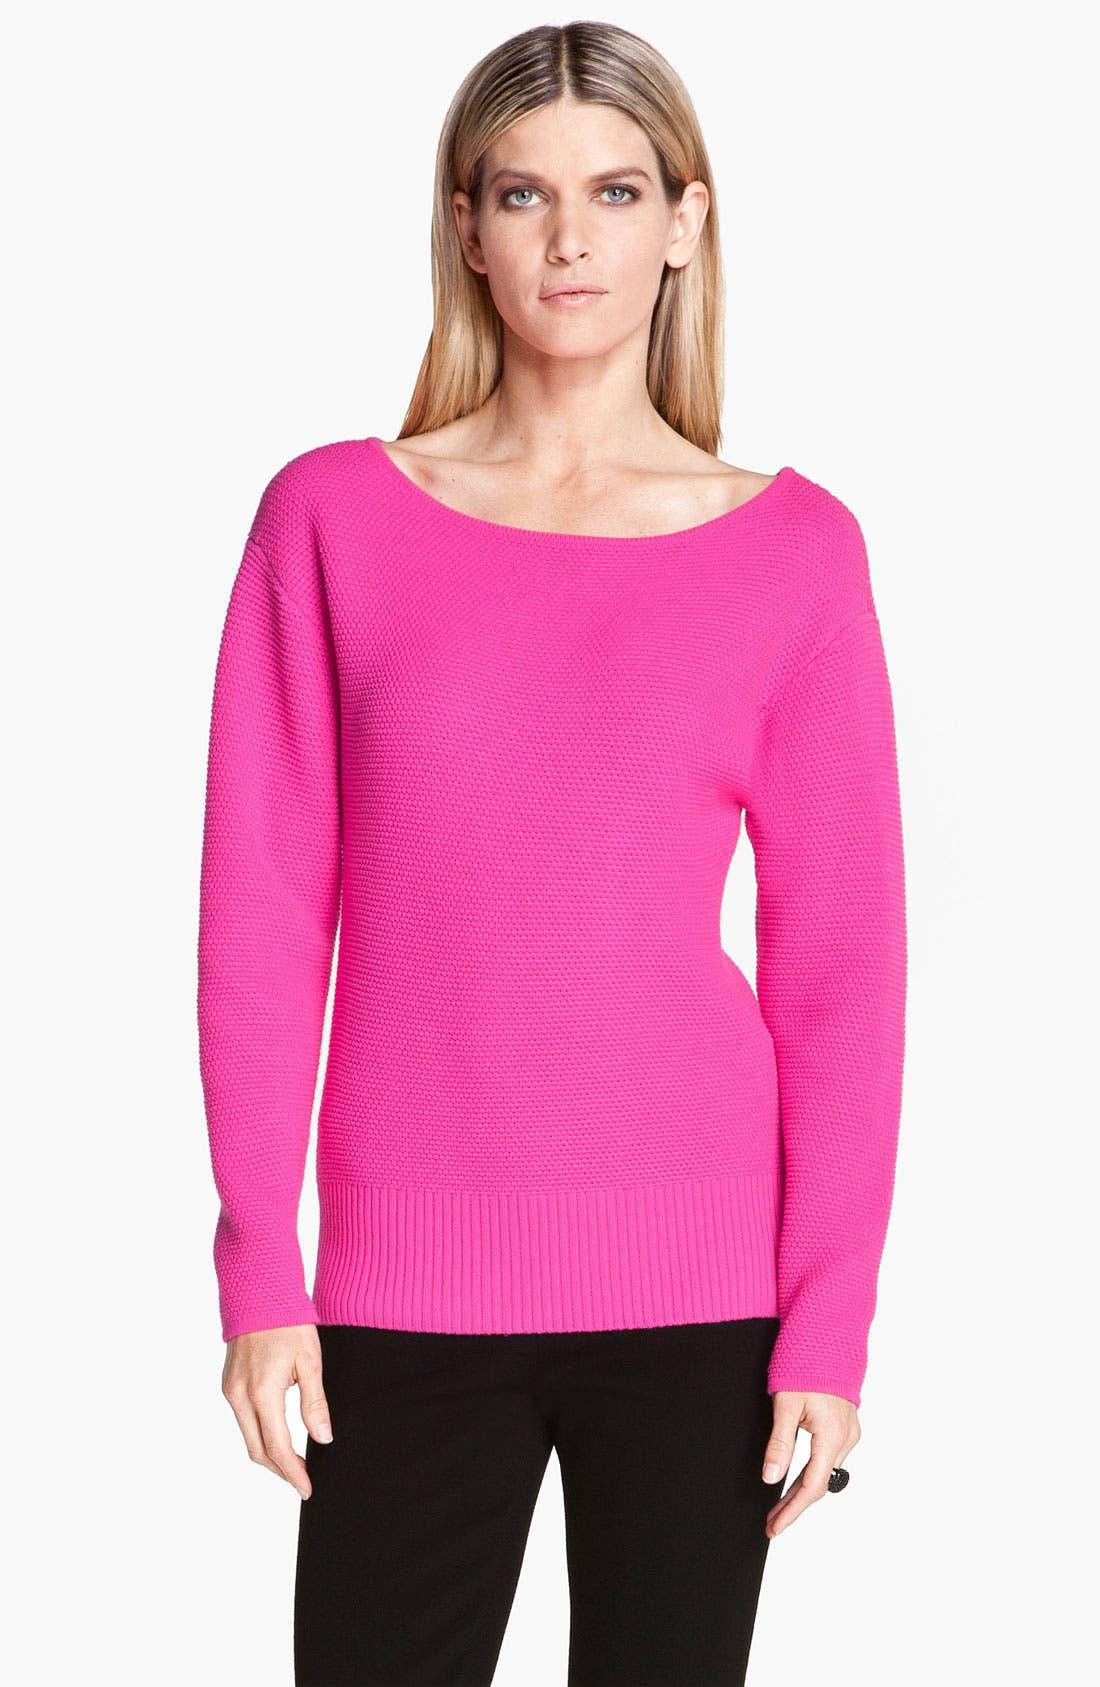 Main Image - St. John Yellow Label Micro Piqué Knit Sweater